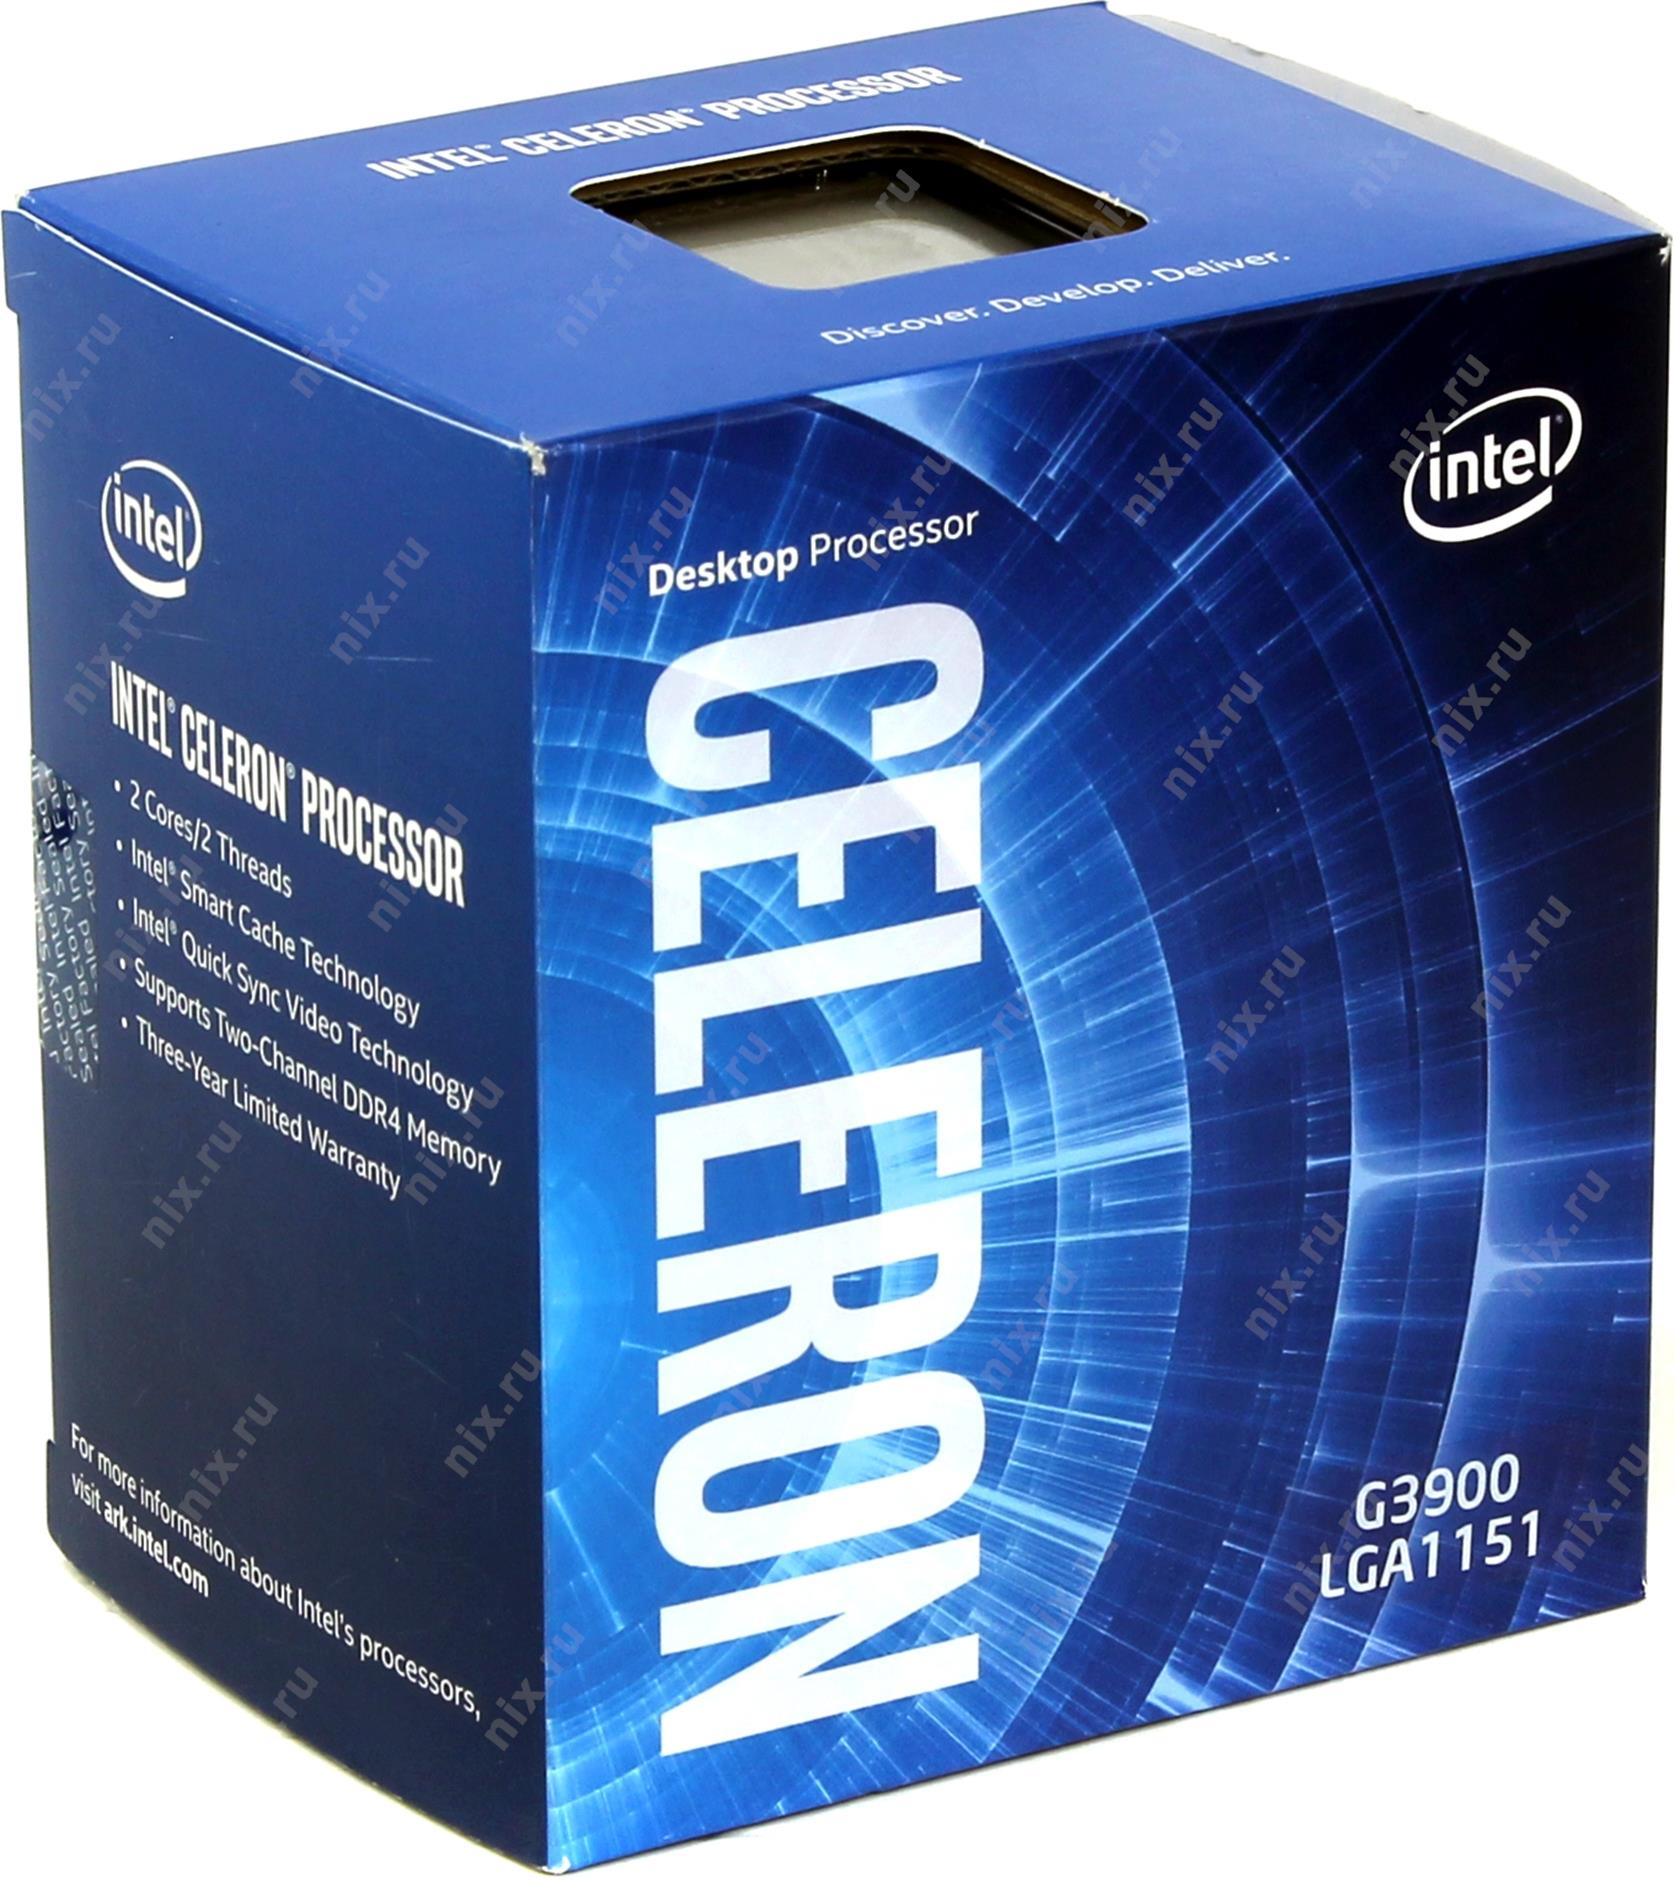 Intel Celeron Processor G3900  (2M Cache, 2.80 GHz)